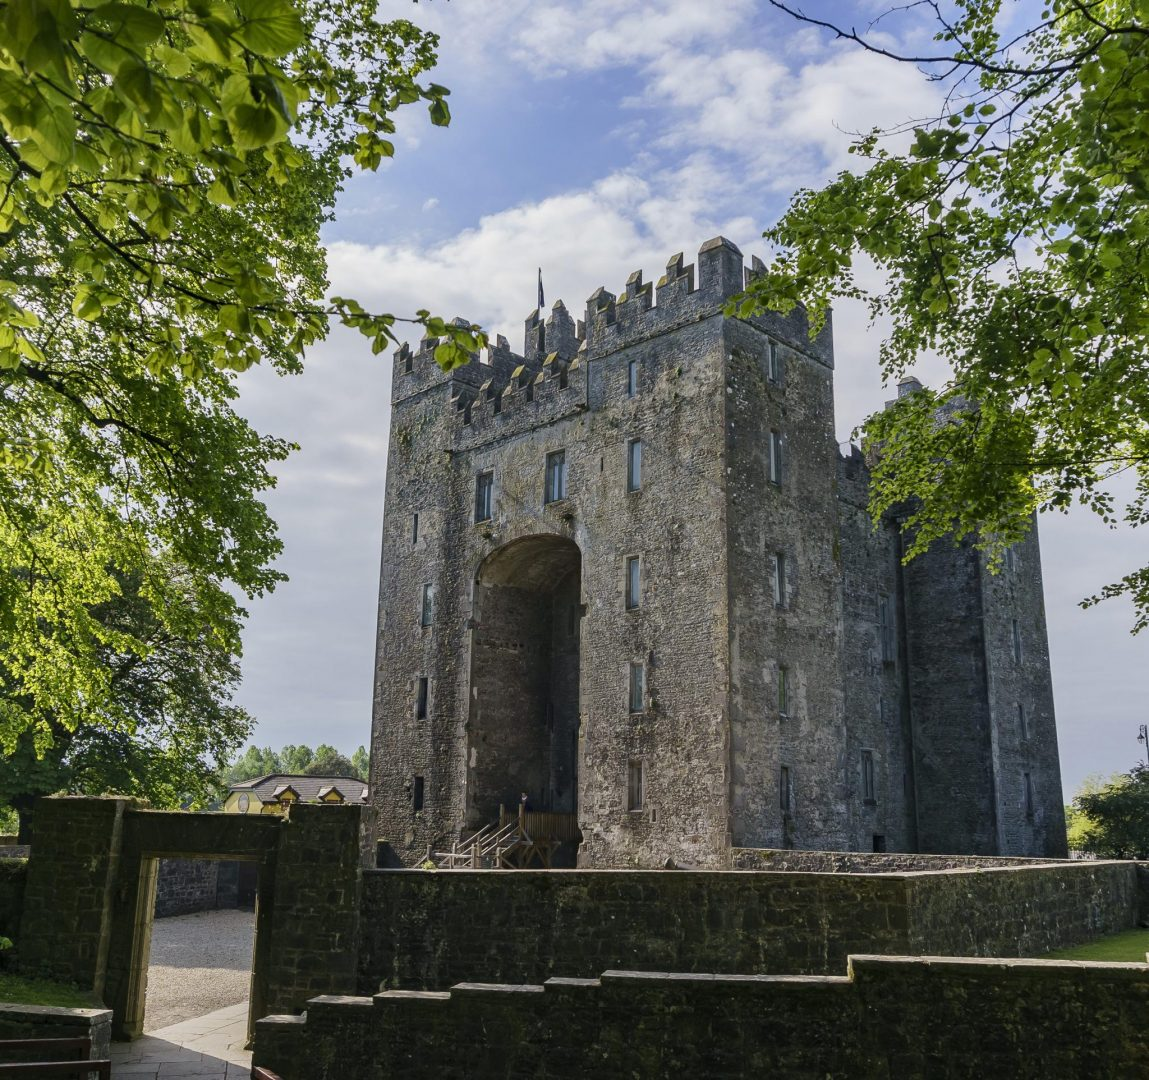 Bunratty Castle and Bunratty Folk Park